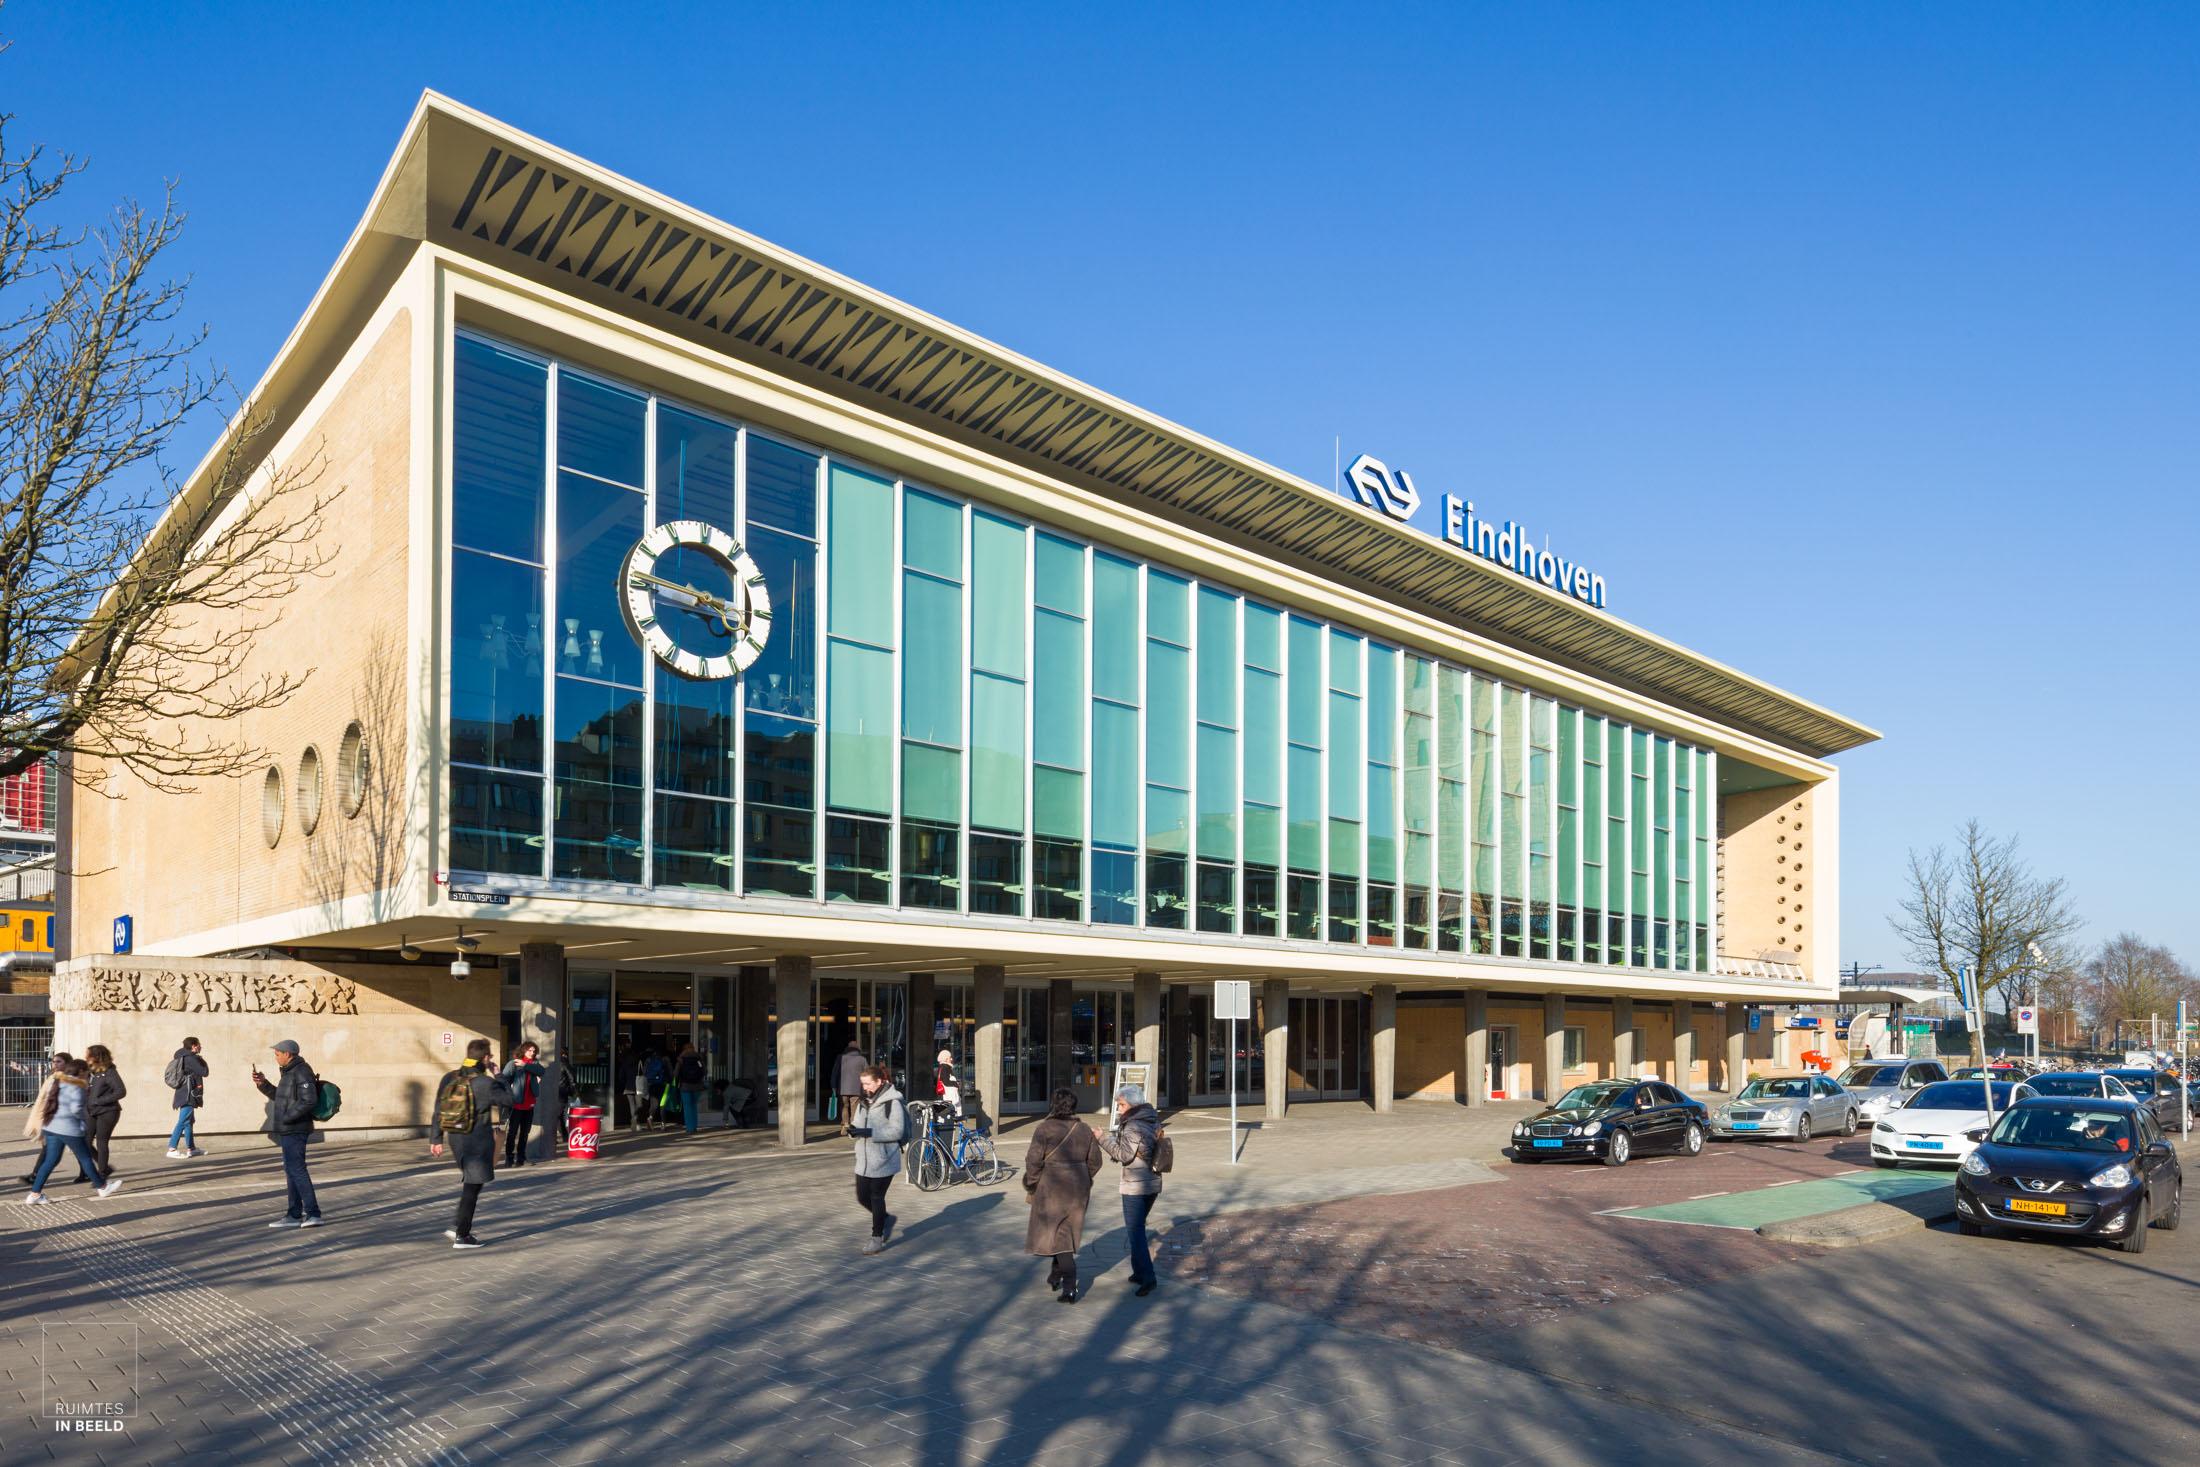 Station-Eindhoven-11.jpg